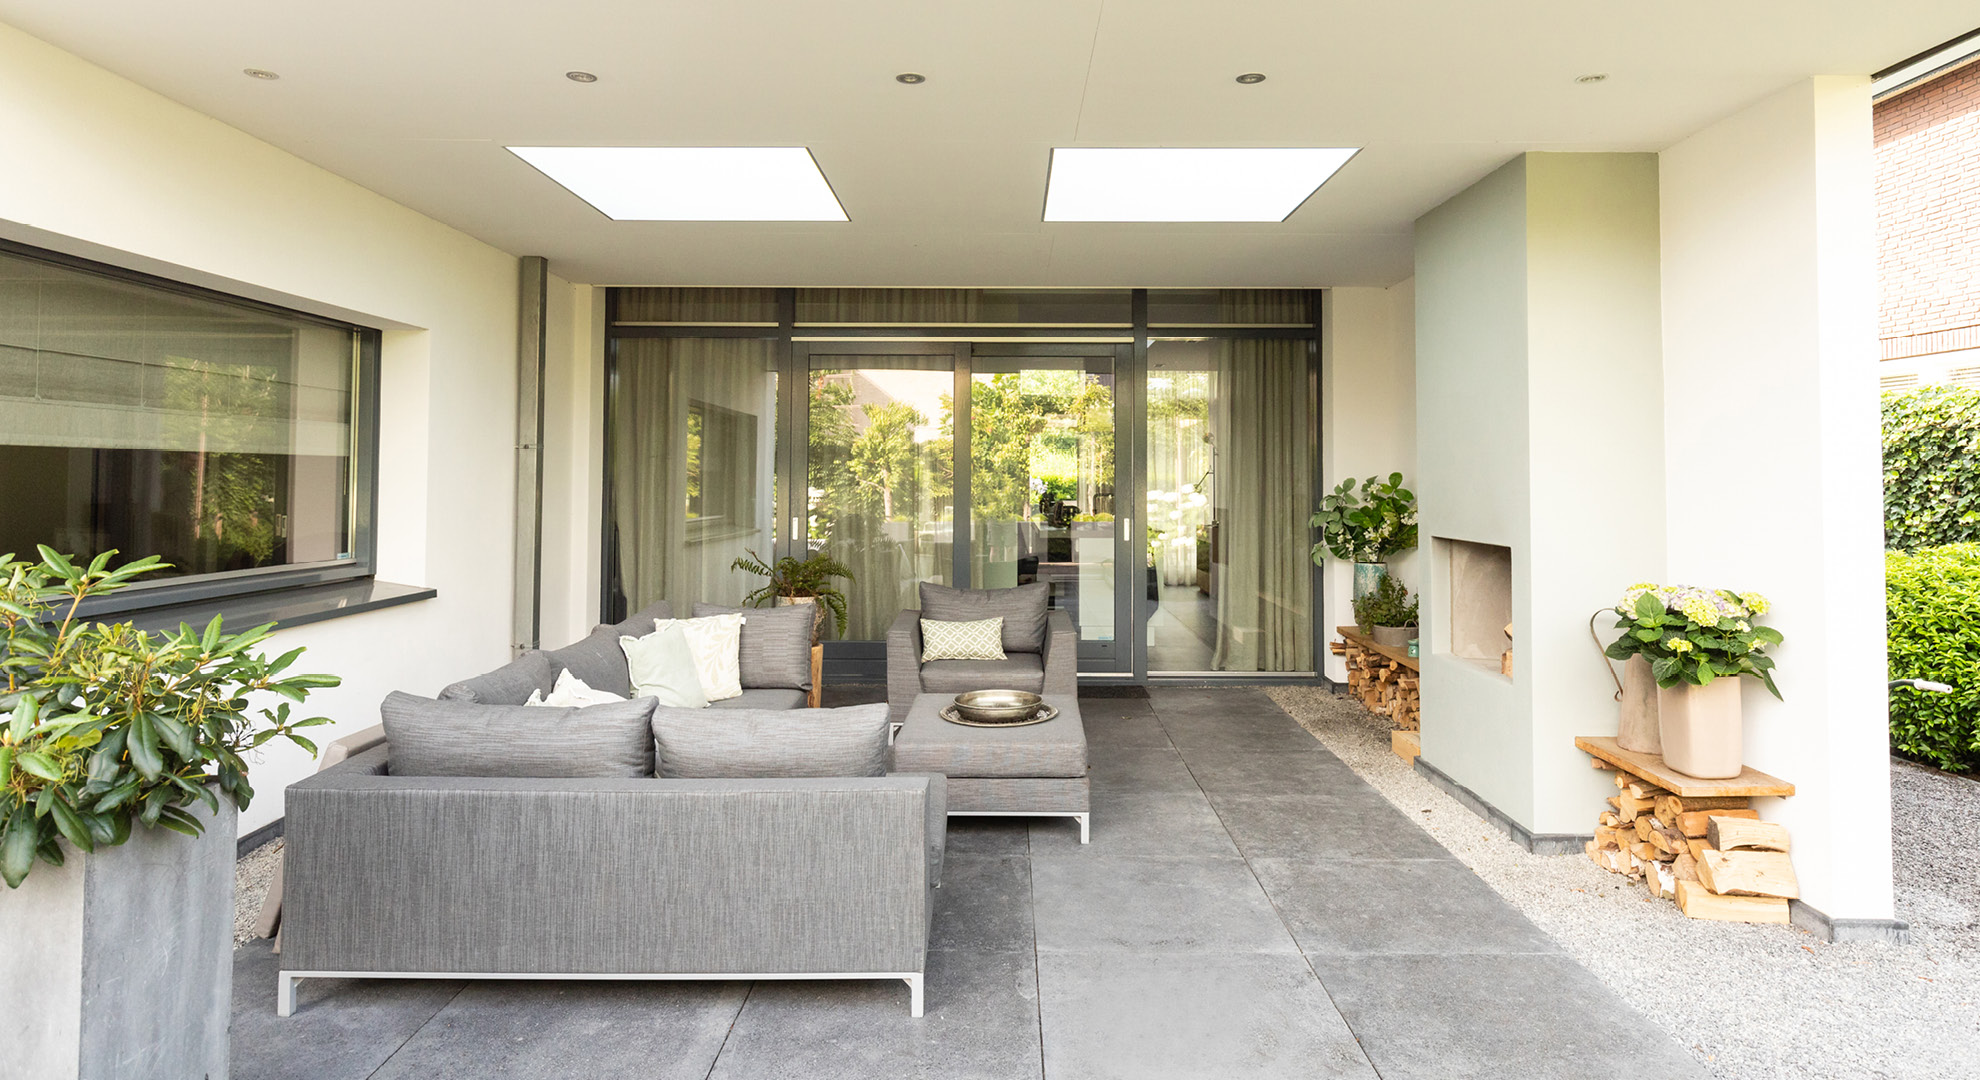 Moderne tuin met spiegelvijver en buitenhaard - Foto 3